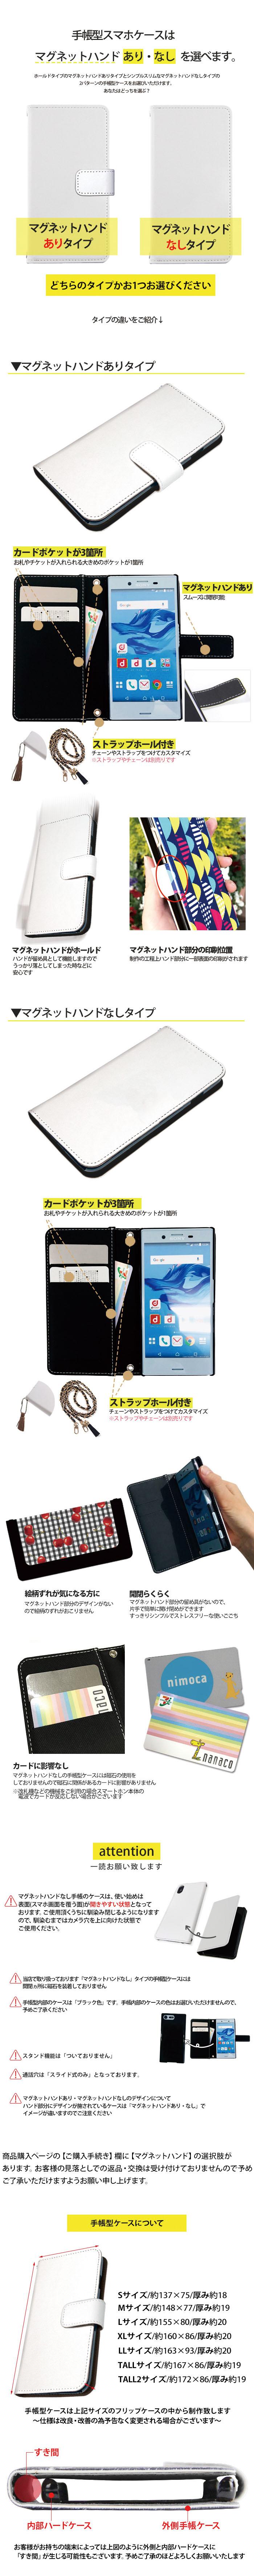 f4cabe74ad 楽天市場】広島東洋カープ グッズ スマホケース 手帳型 多機種対応 ...